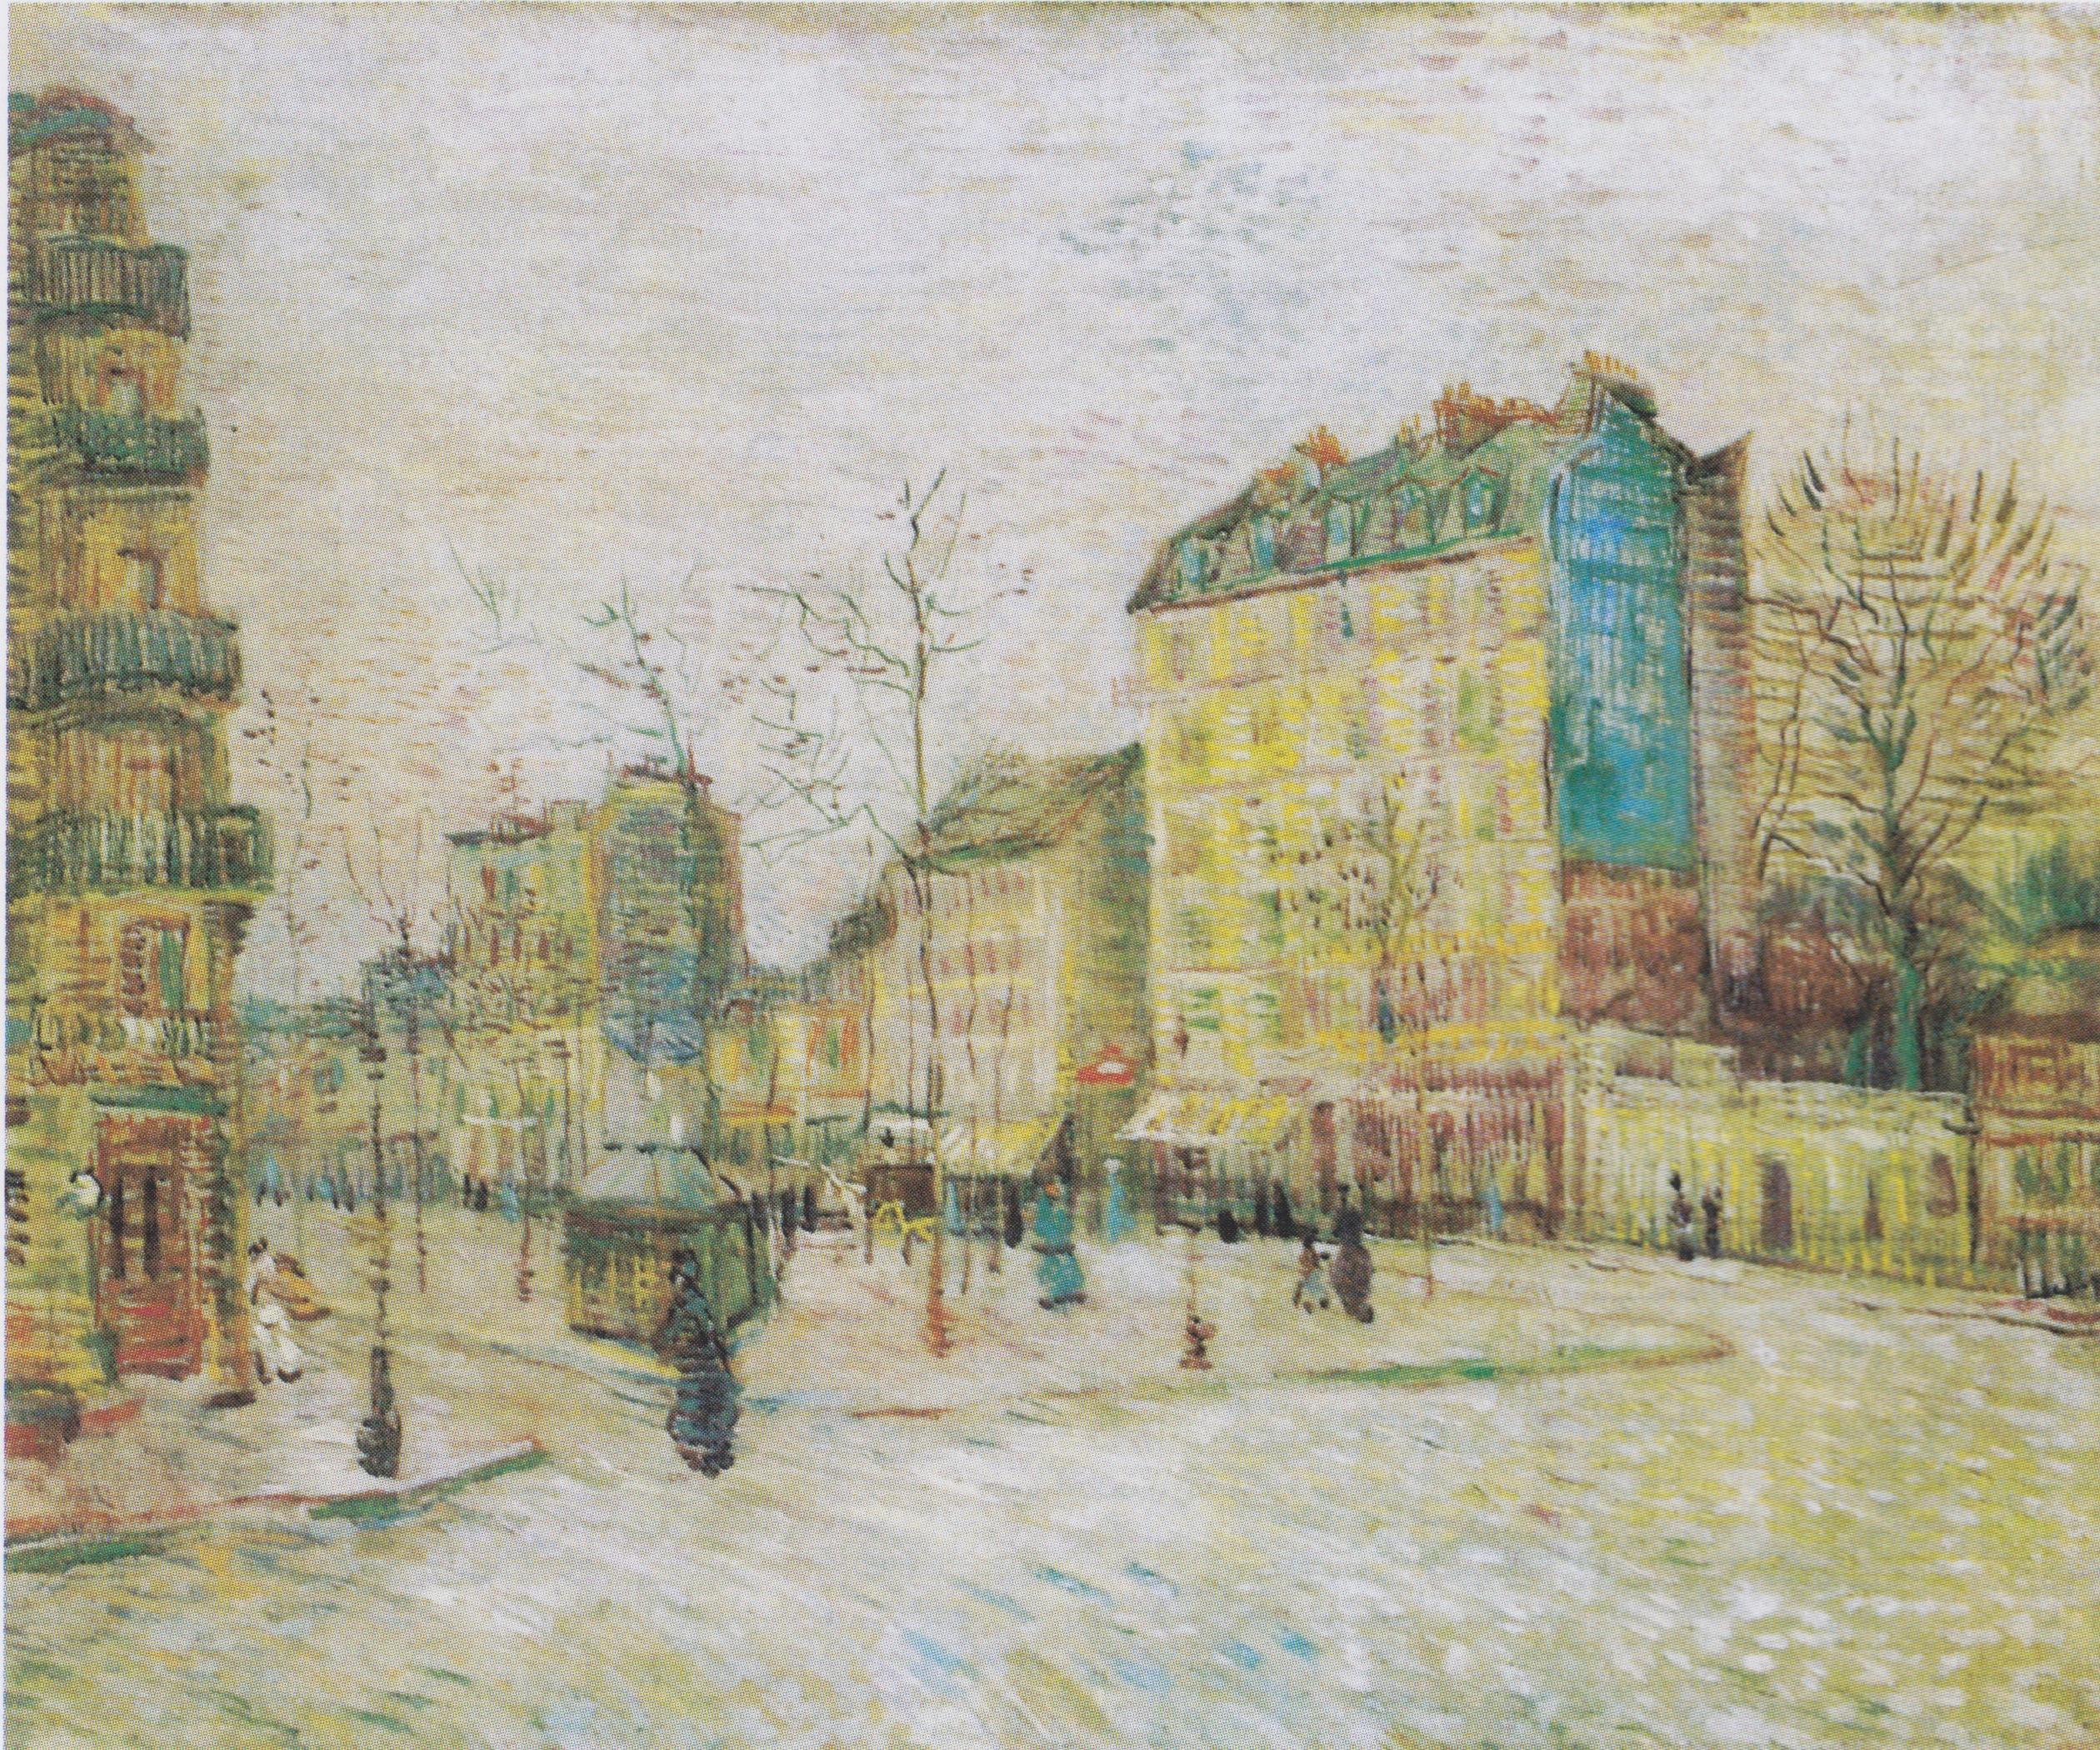 Vincent Van Gogh, Boulevard de Clichy, Paris - 1887, tuval üzerine yağlıboya, 45,5 x 55 cm, Van Gogh Museum